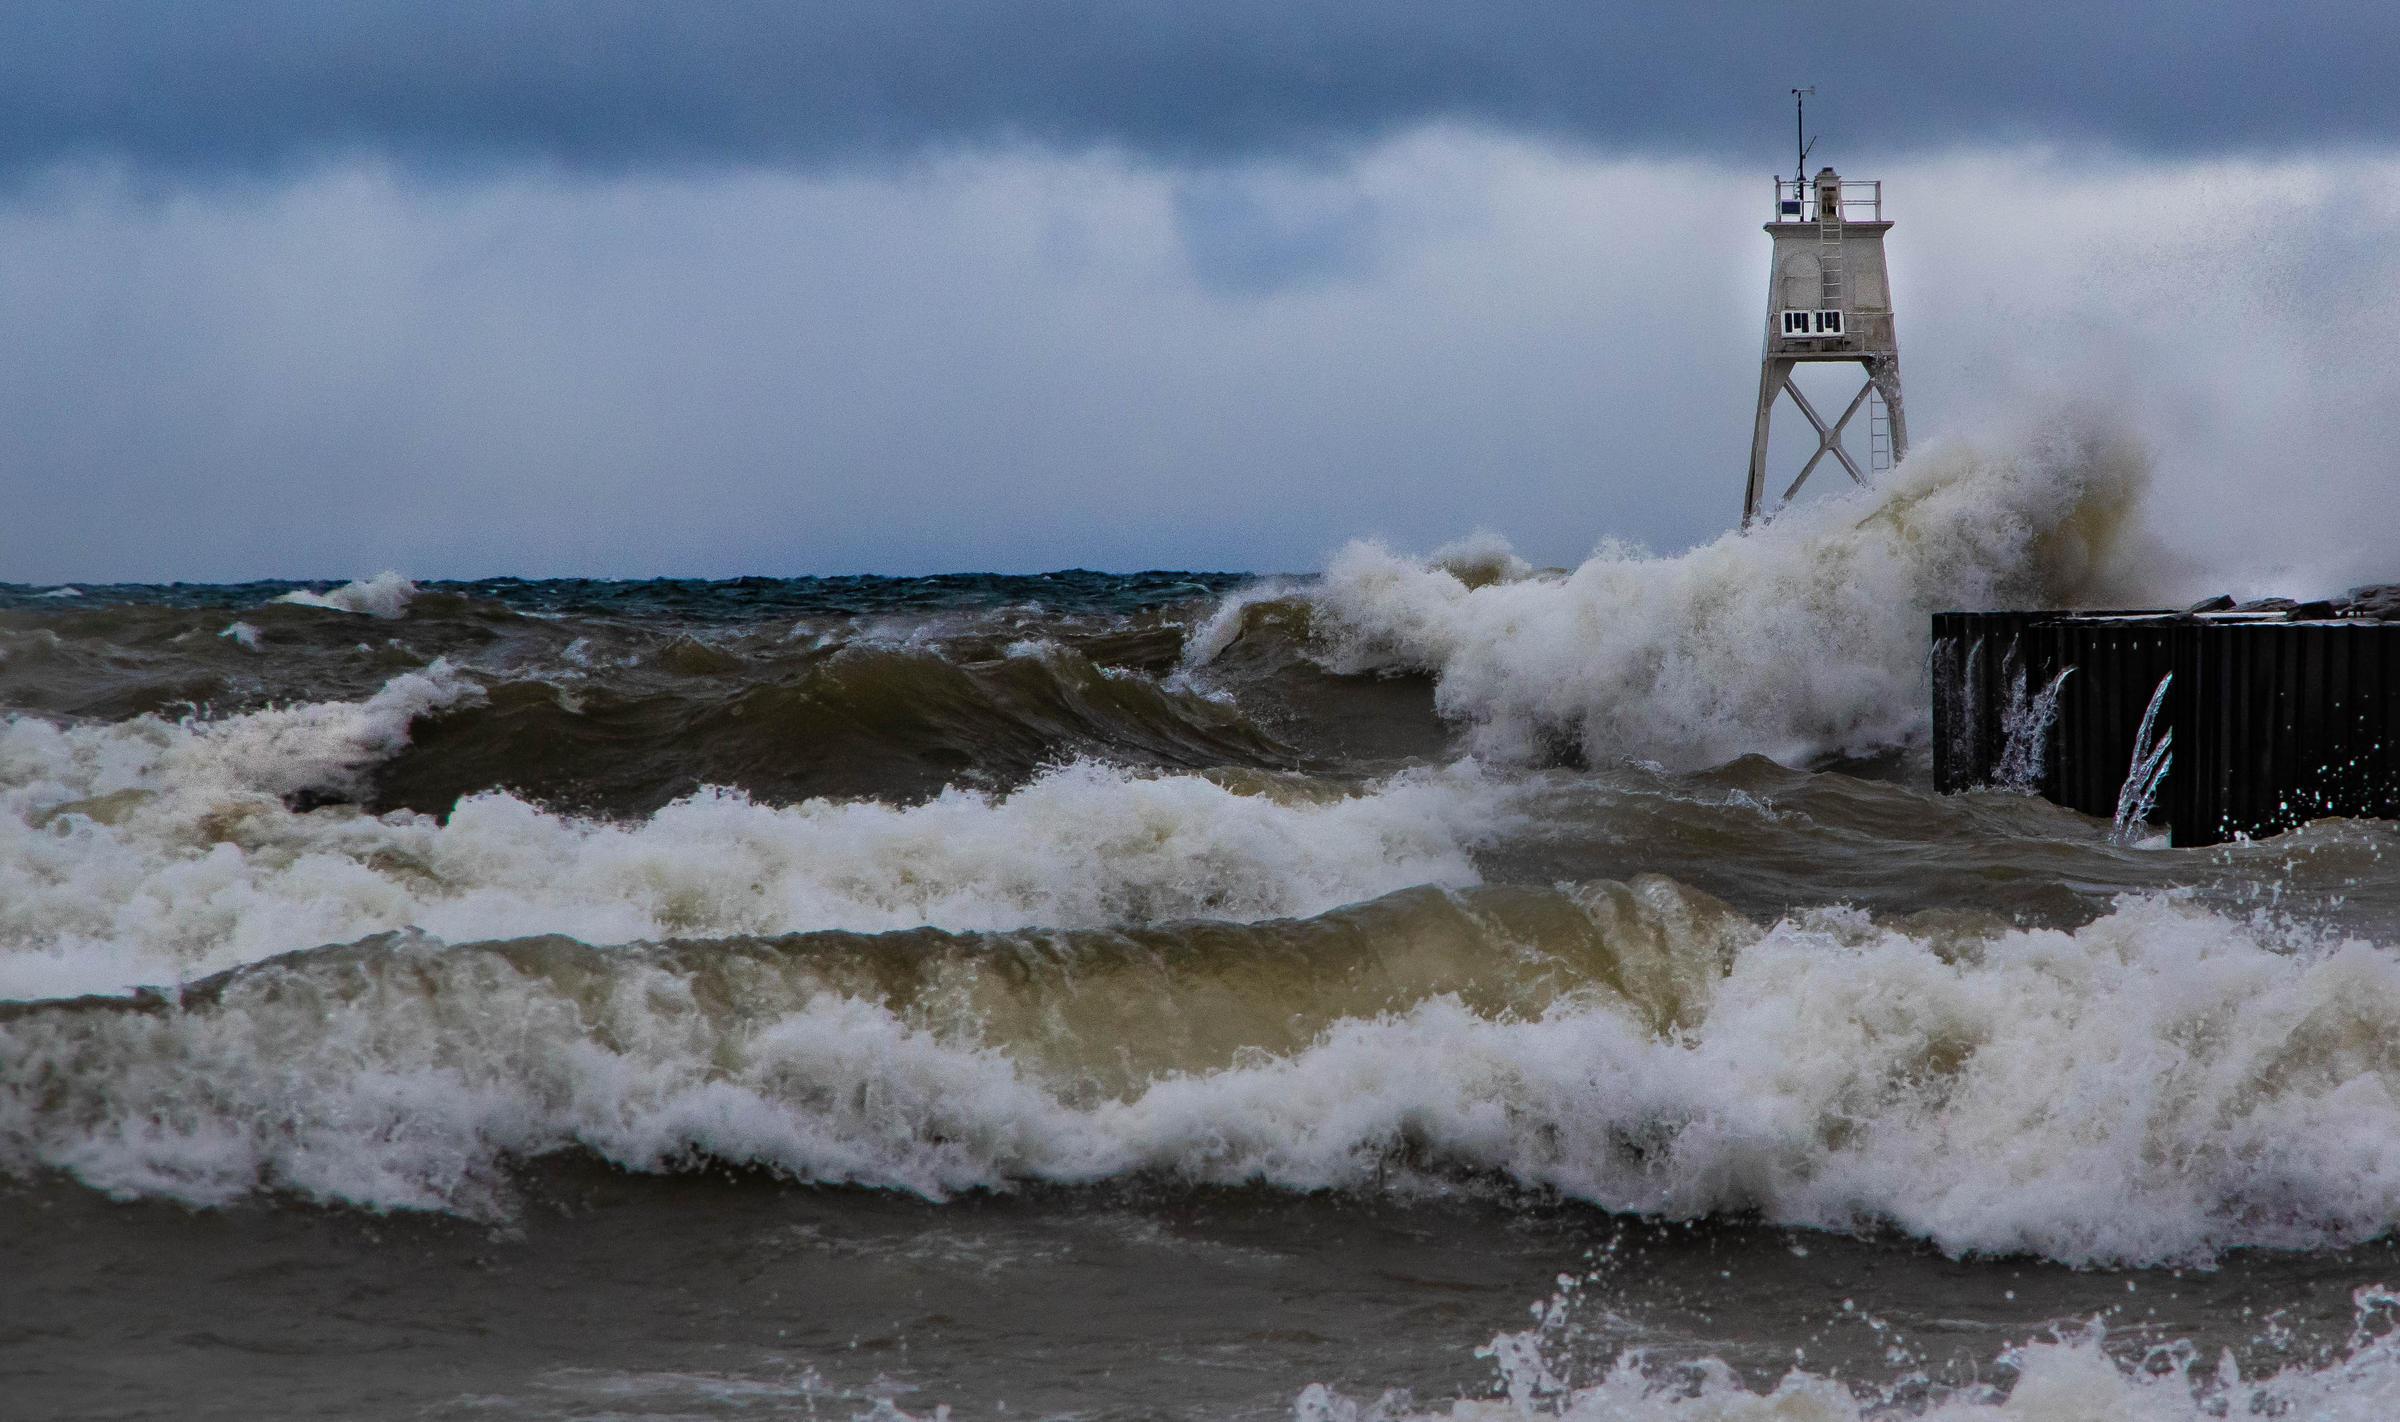 Gale Force Winds Blast Northern Great Lakes Interlochen